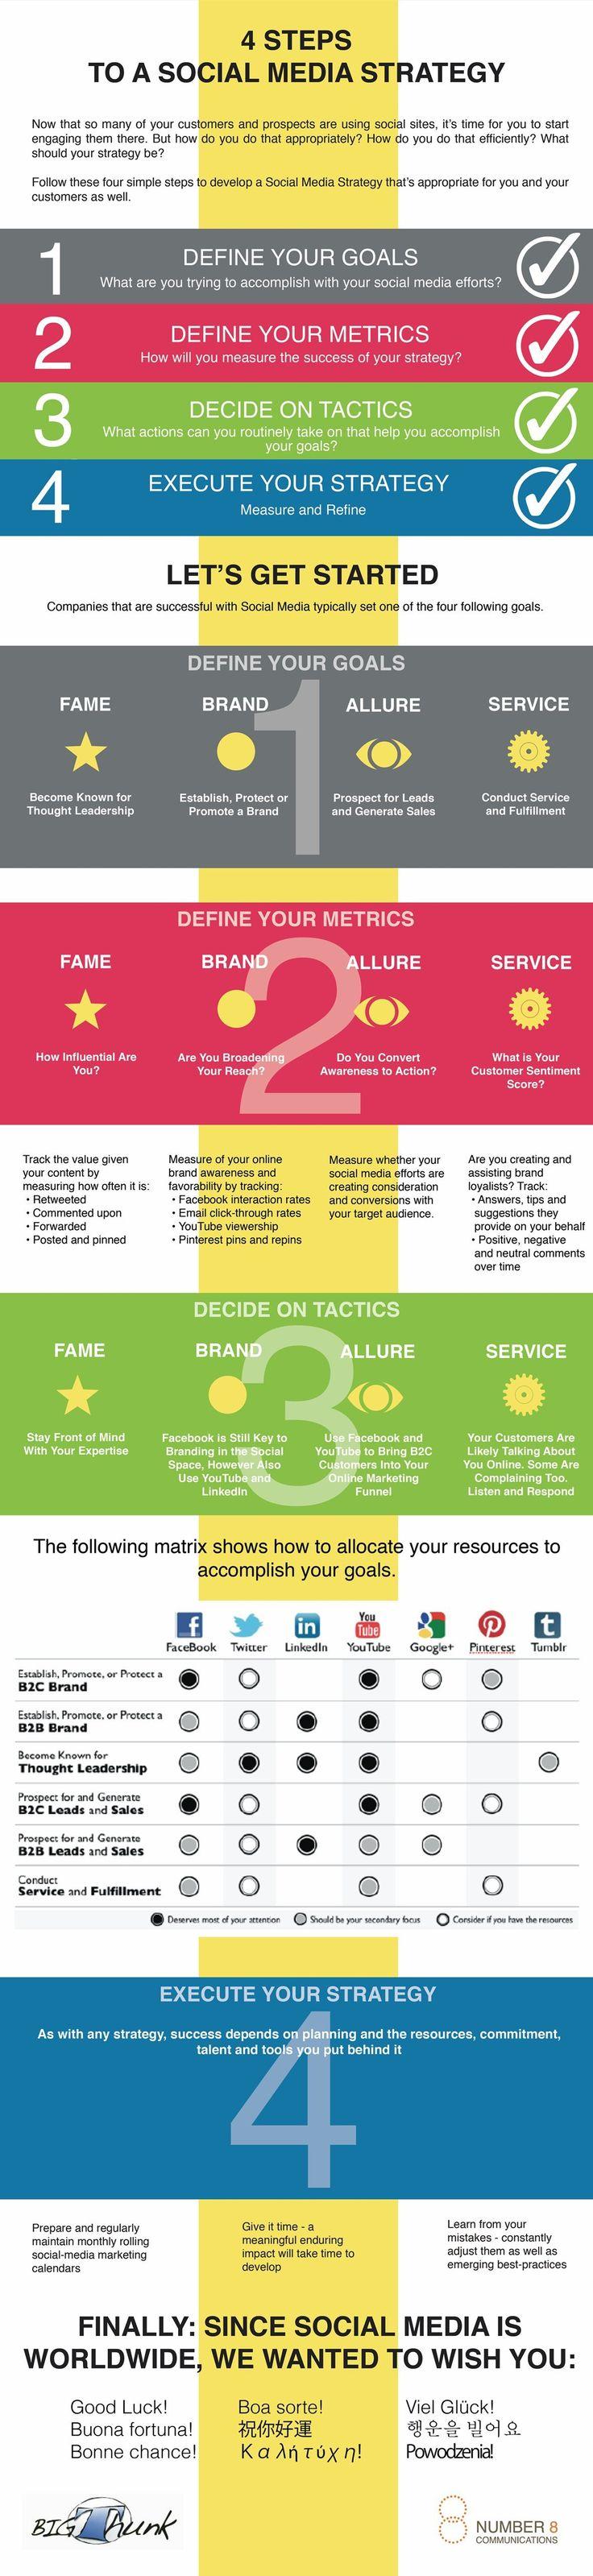 The 4 Steps to Social Media Marketing